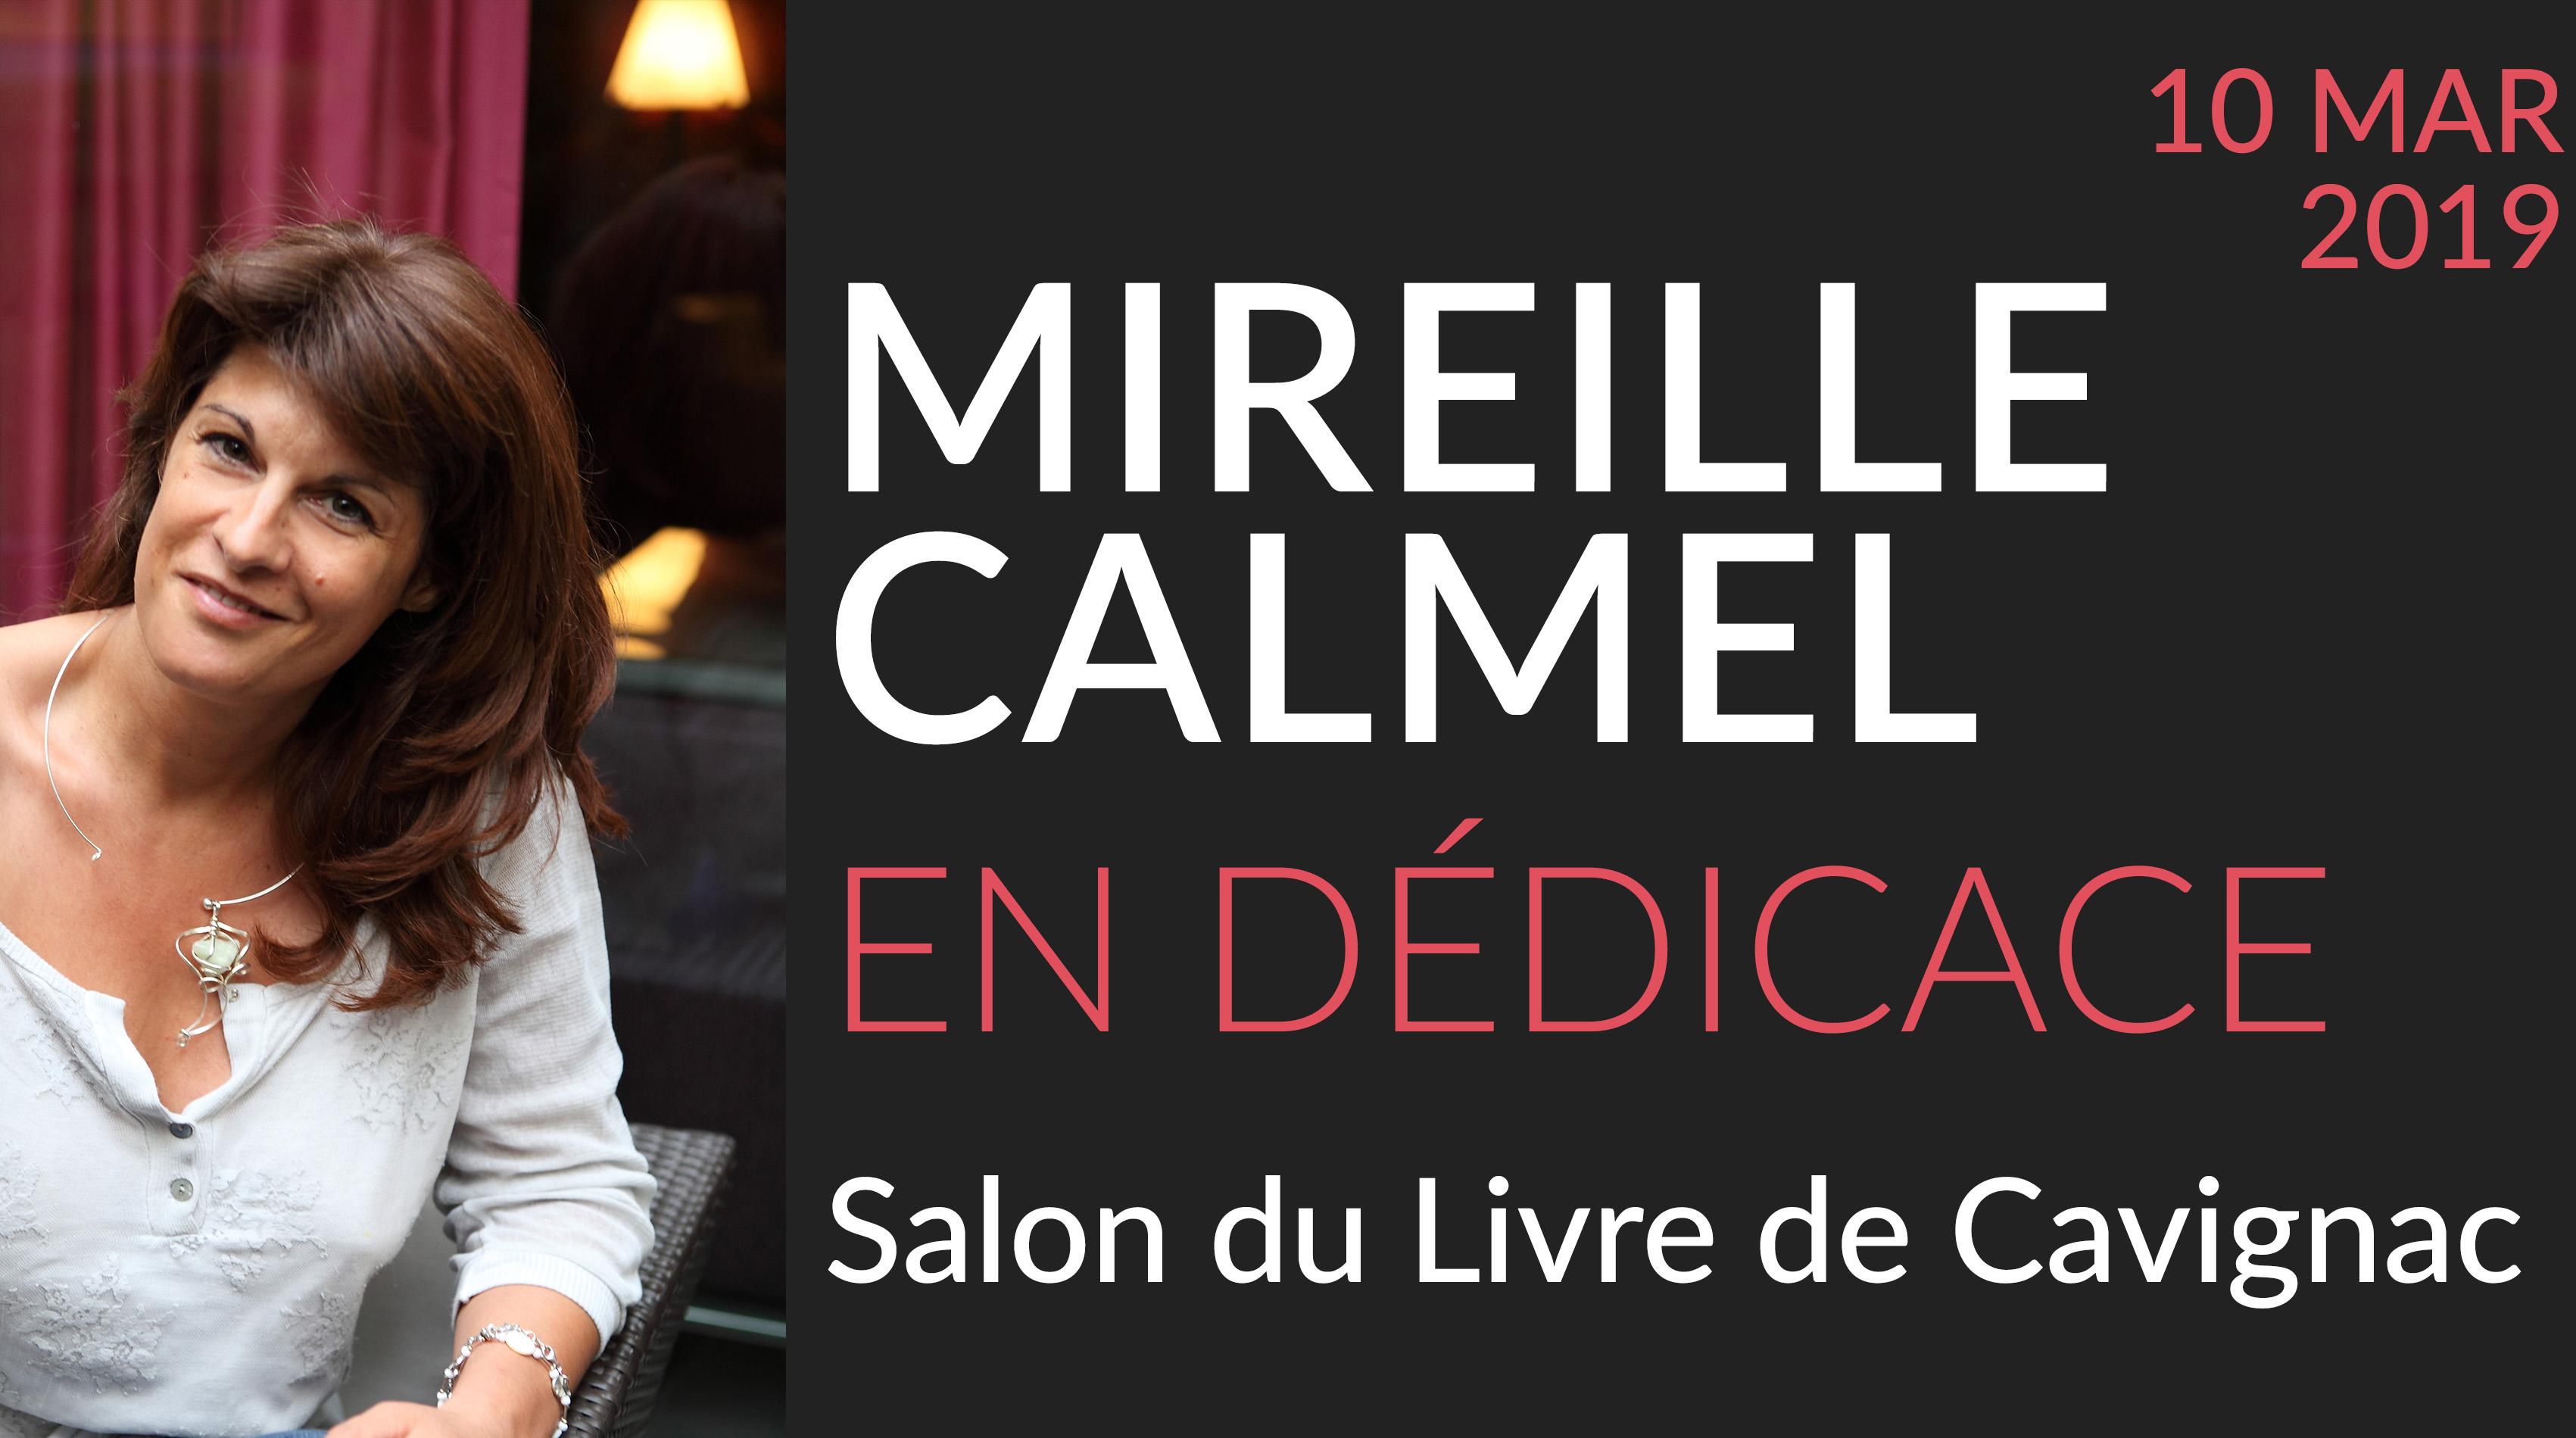 Mireille Calmel au Salon du Livre de Cavignac